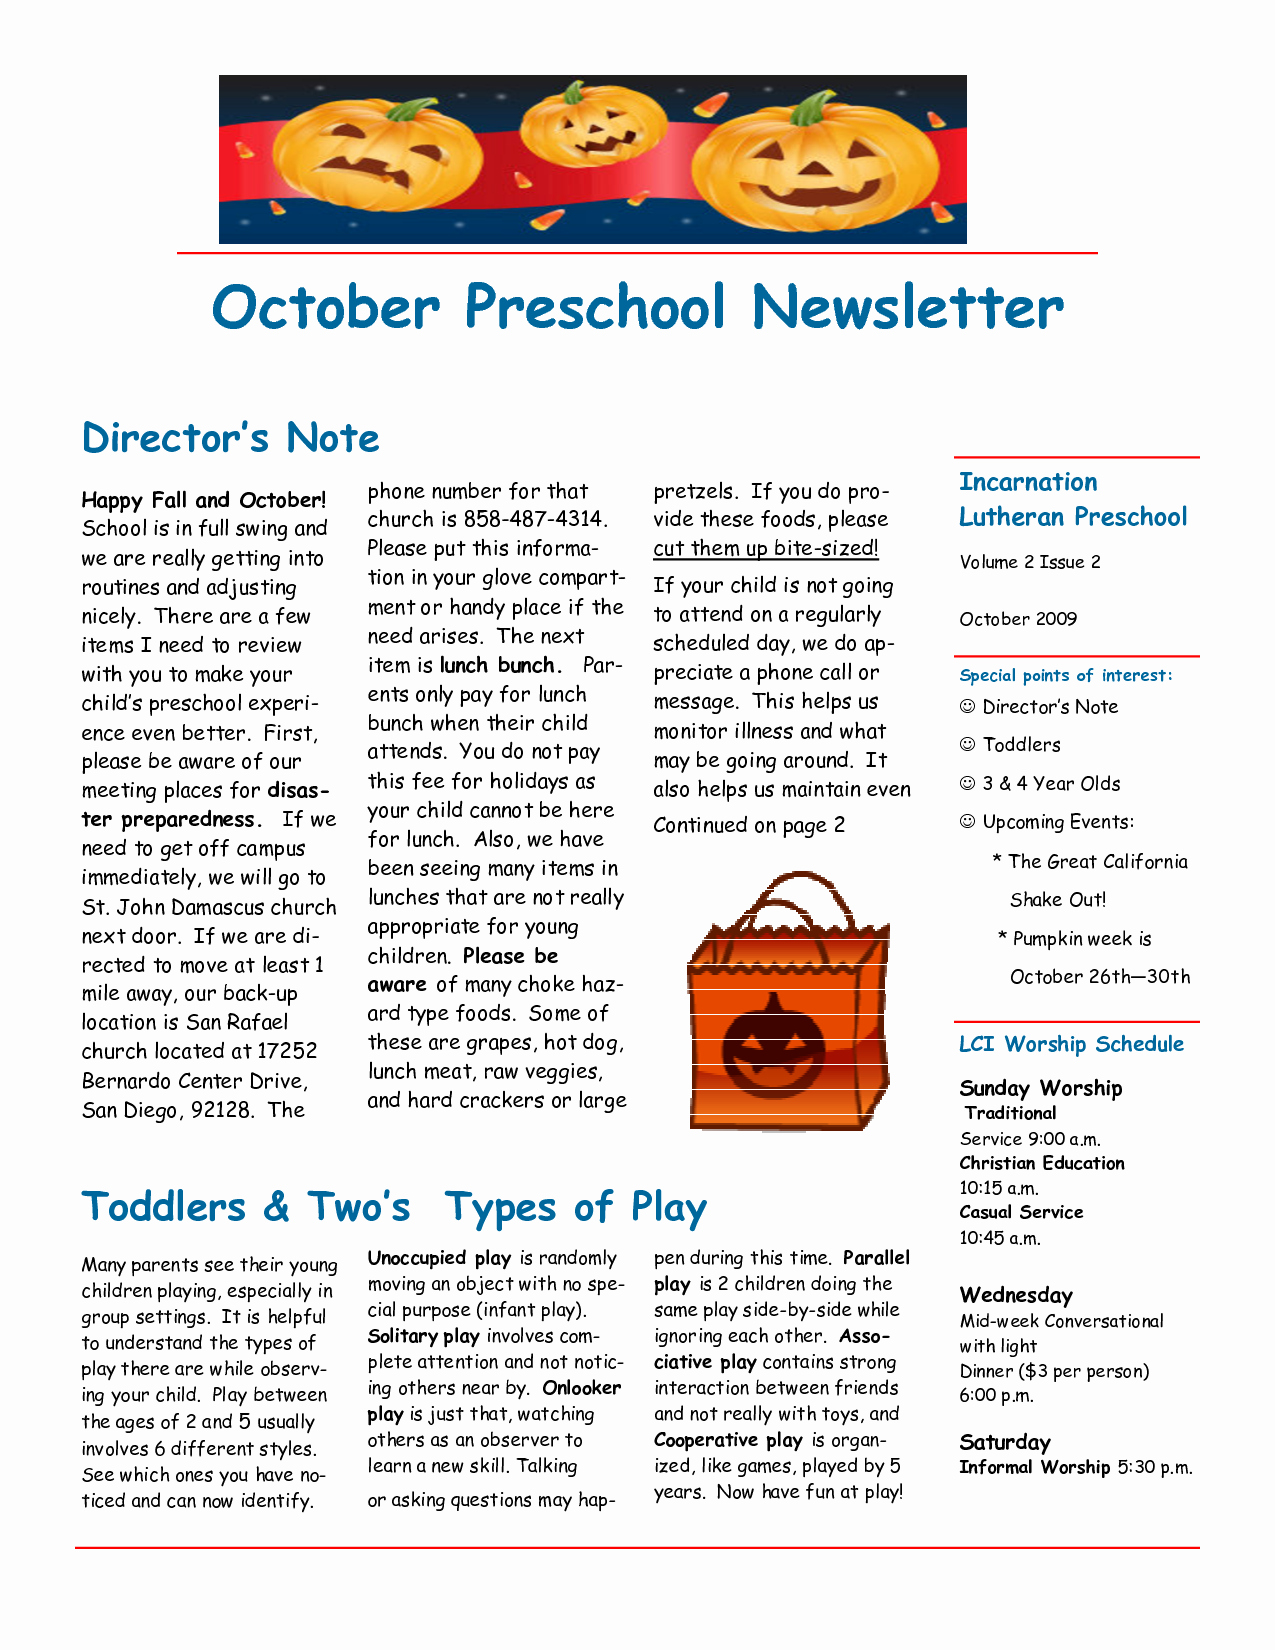 Free October Newsletter Template New 6 Best Of October Preschool Newsletter Ideas